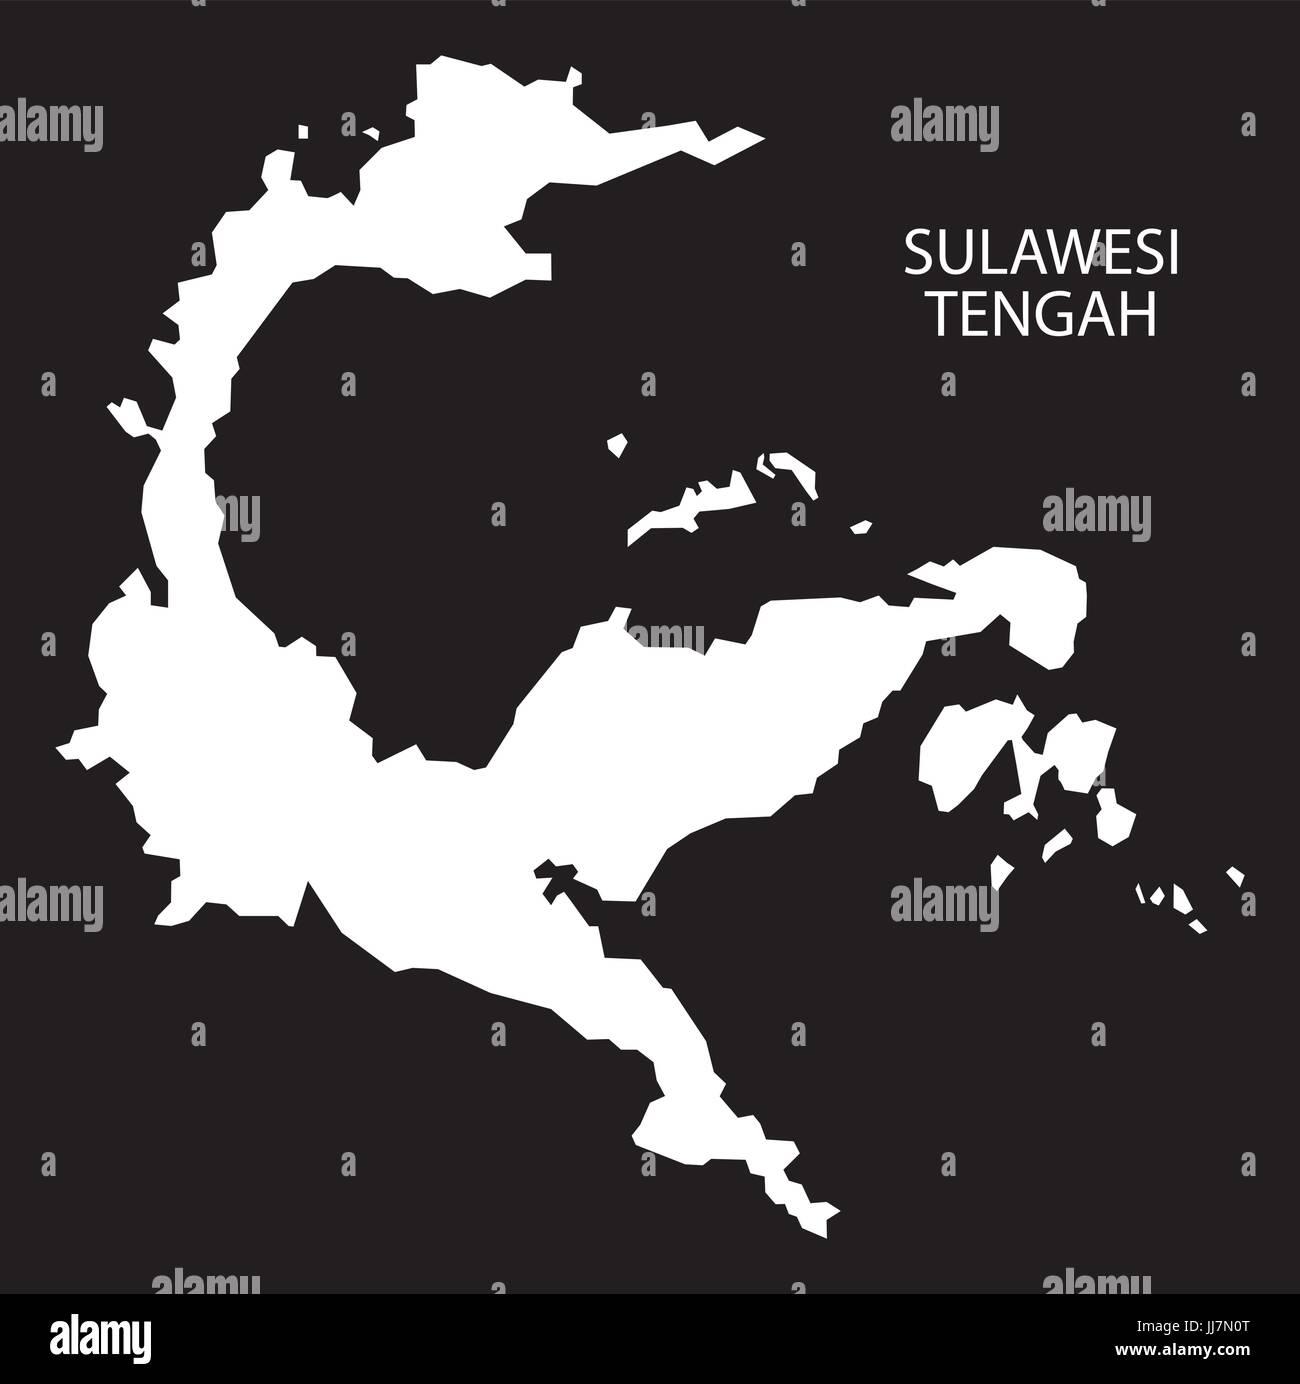 Sulawesi Tengah Indonesia map black inverted silhouette illustration shape - Stock Vector